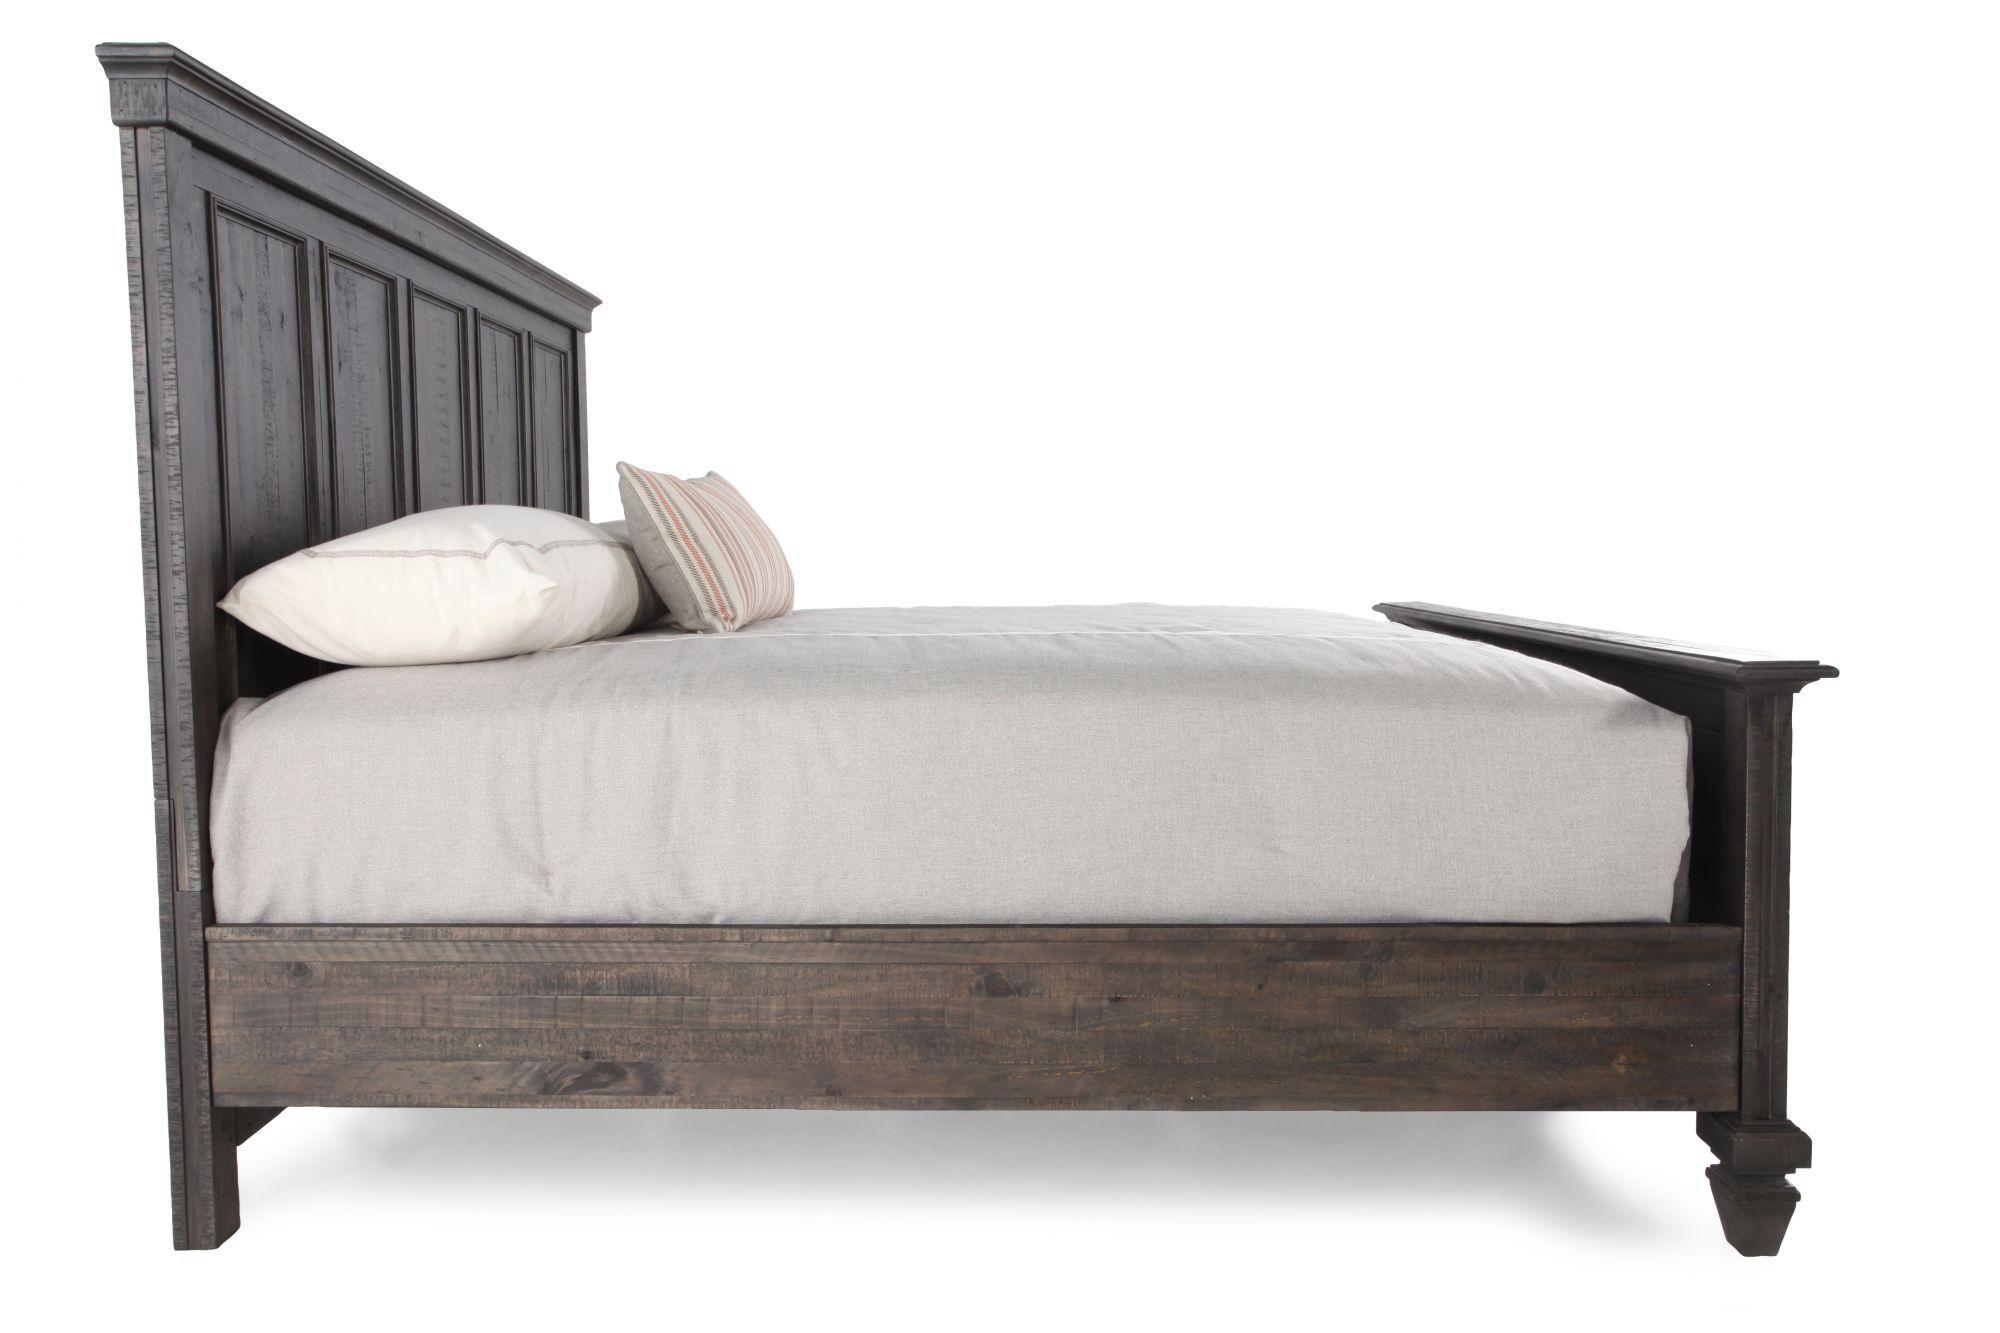 magnussen home calistoga panel bed - Magnussen Furniture